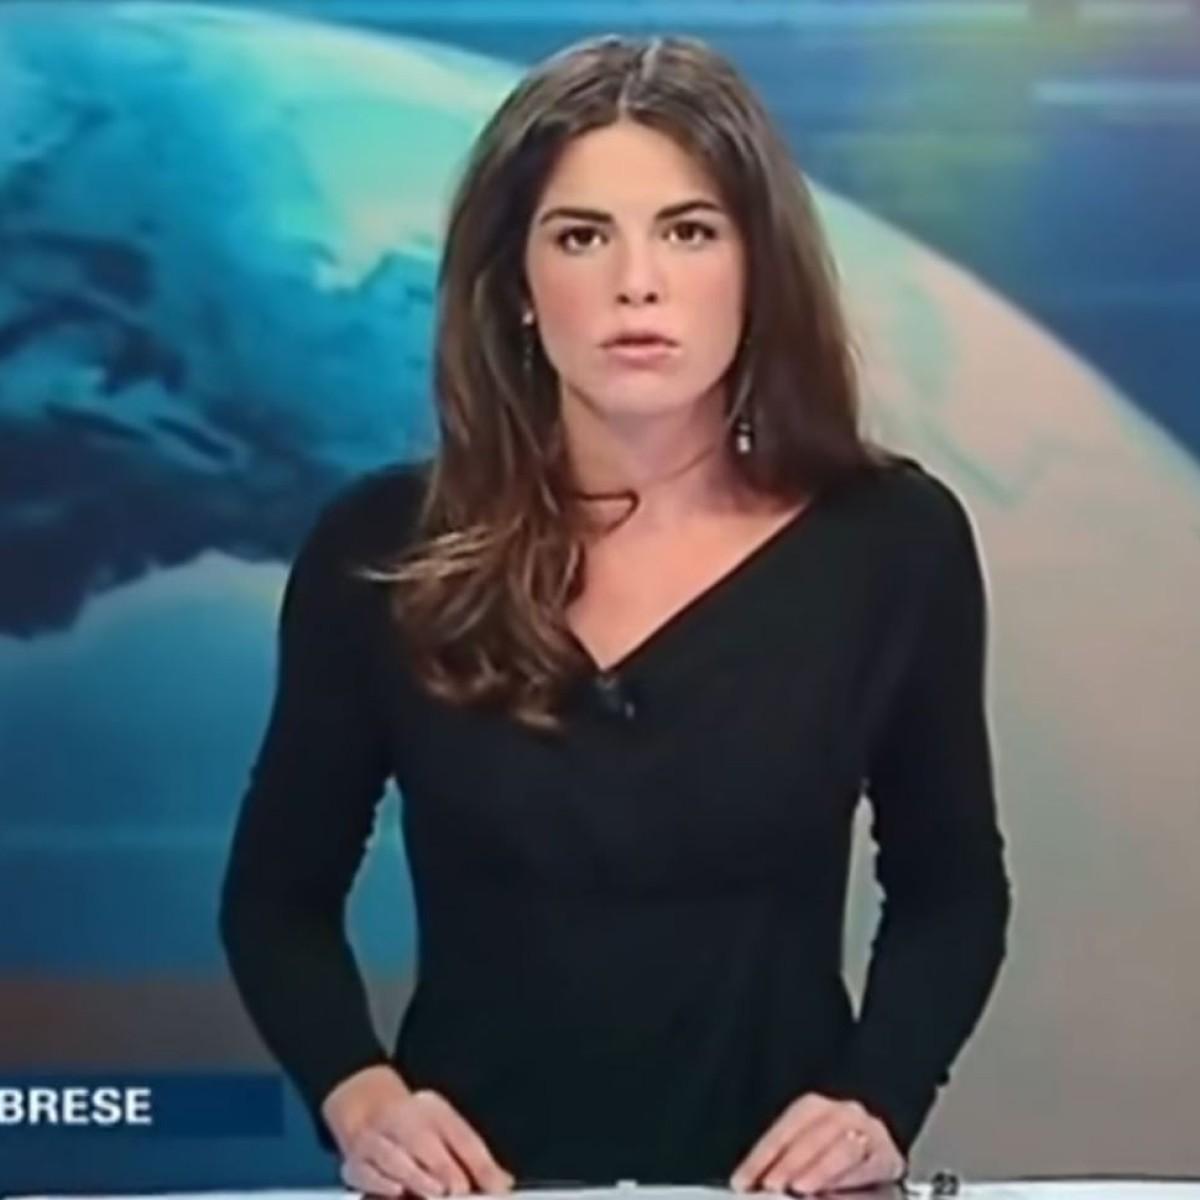 Ohne slip moderatorin Paola Ferrari